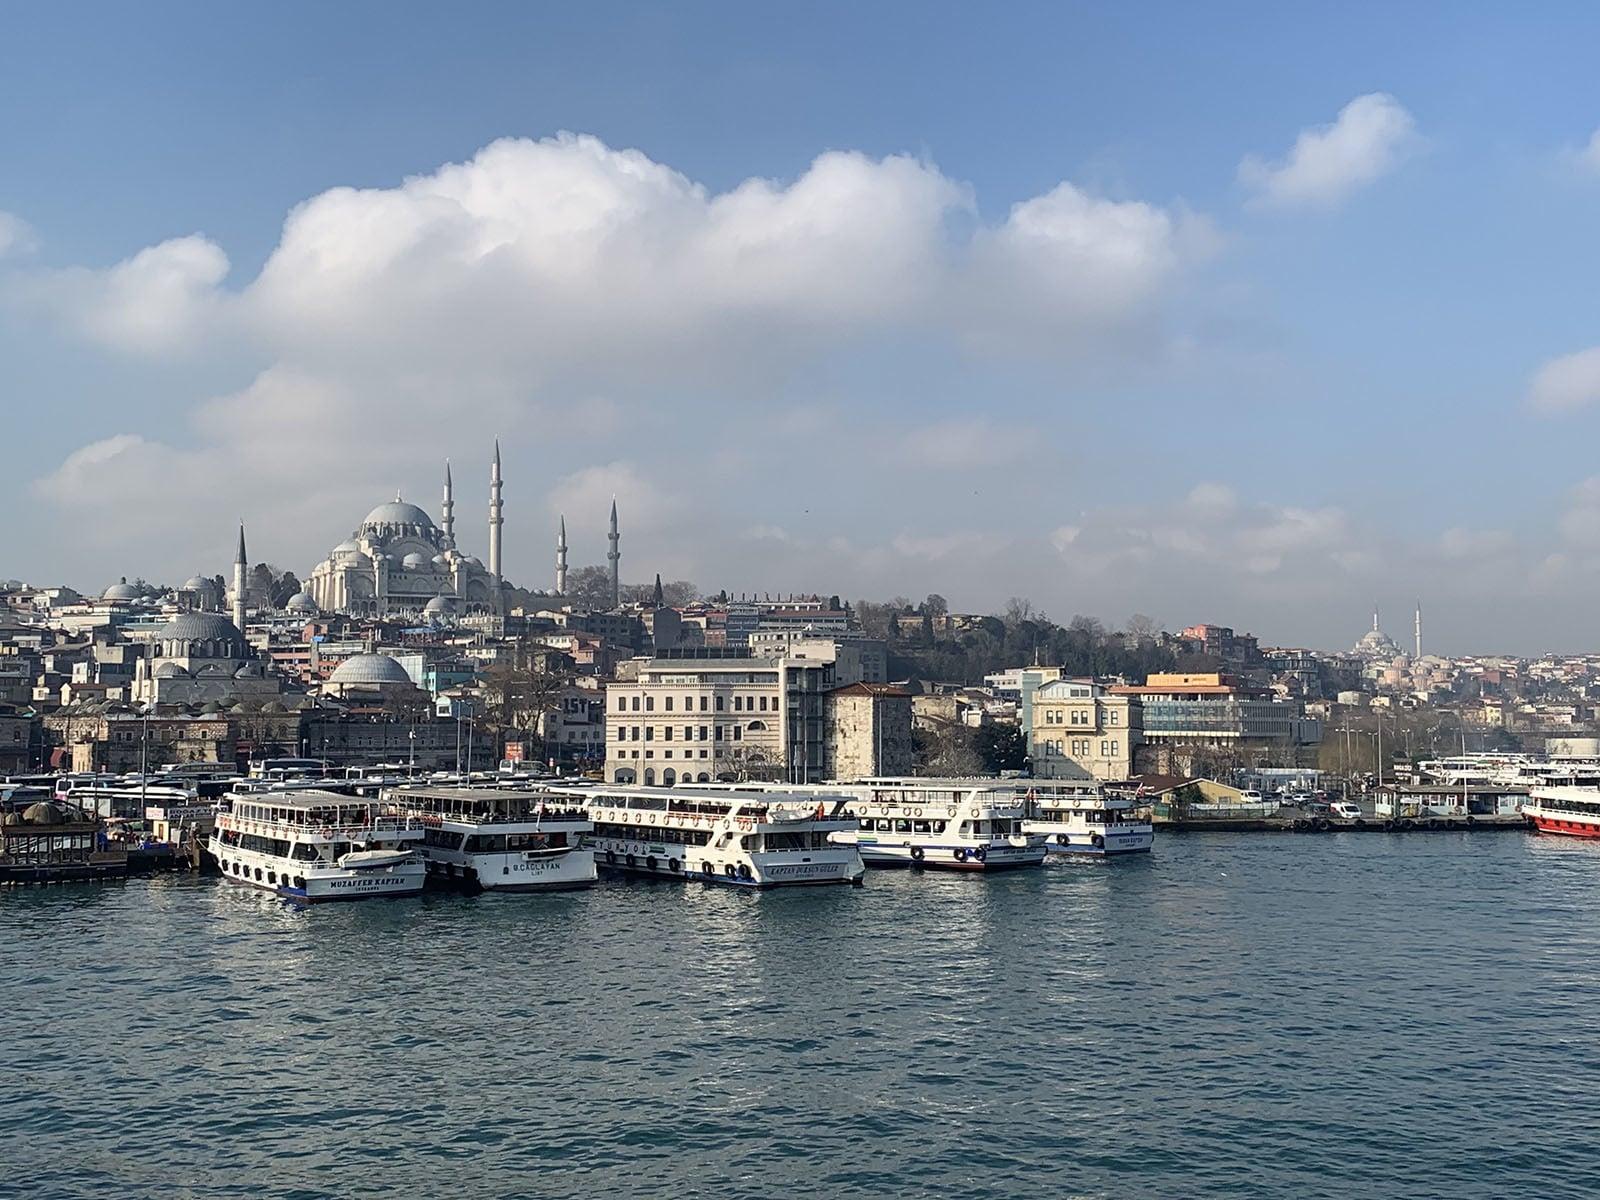 Süleymaniye Mosque seen from the Galata Bridge.